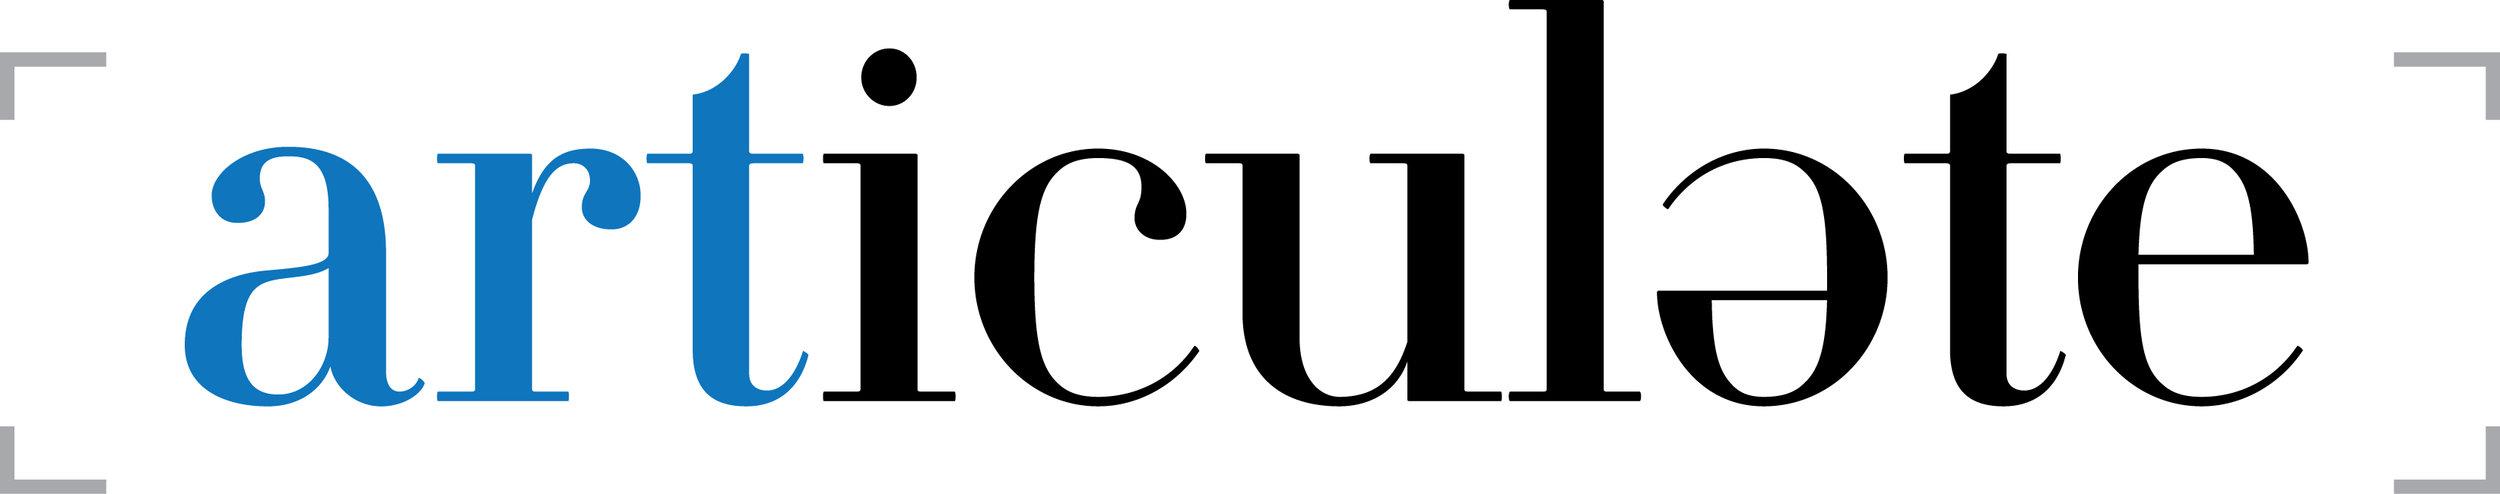 Articulate Basic Logo